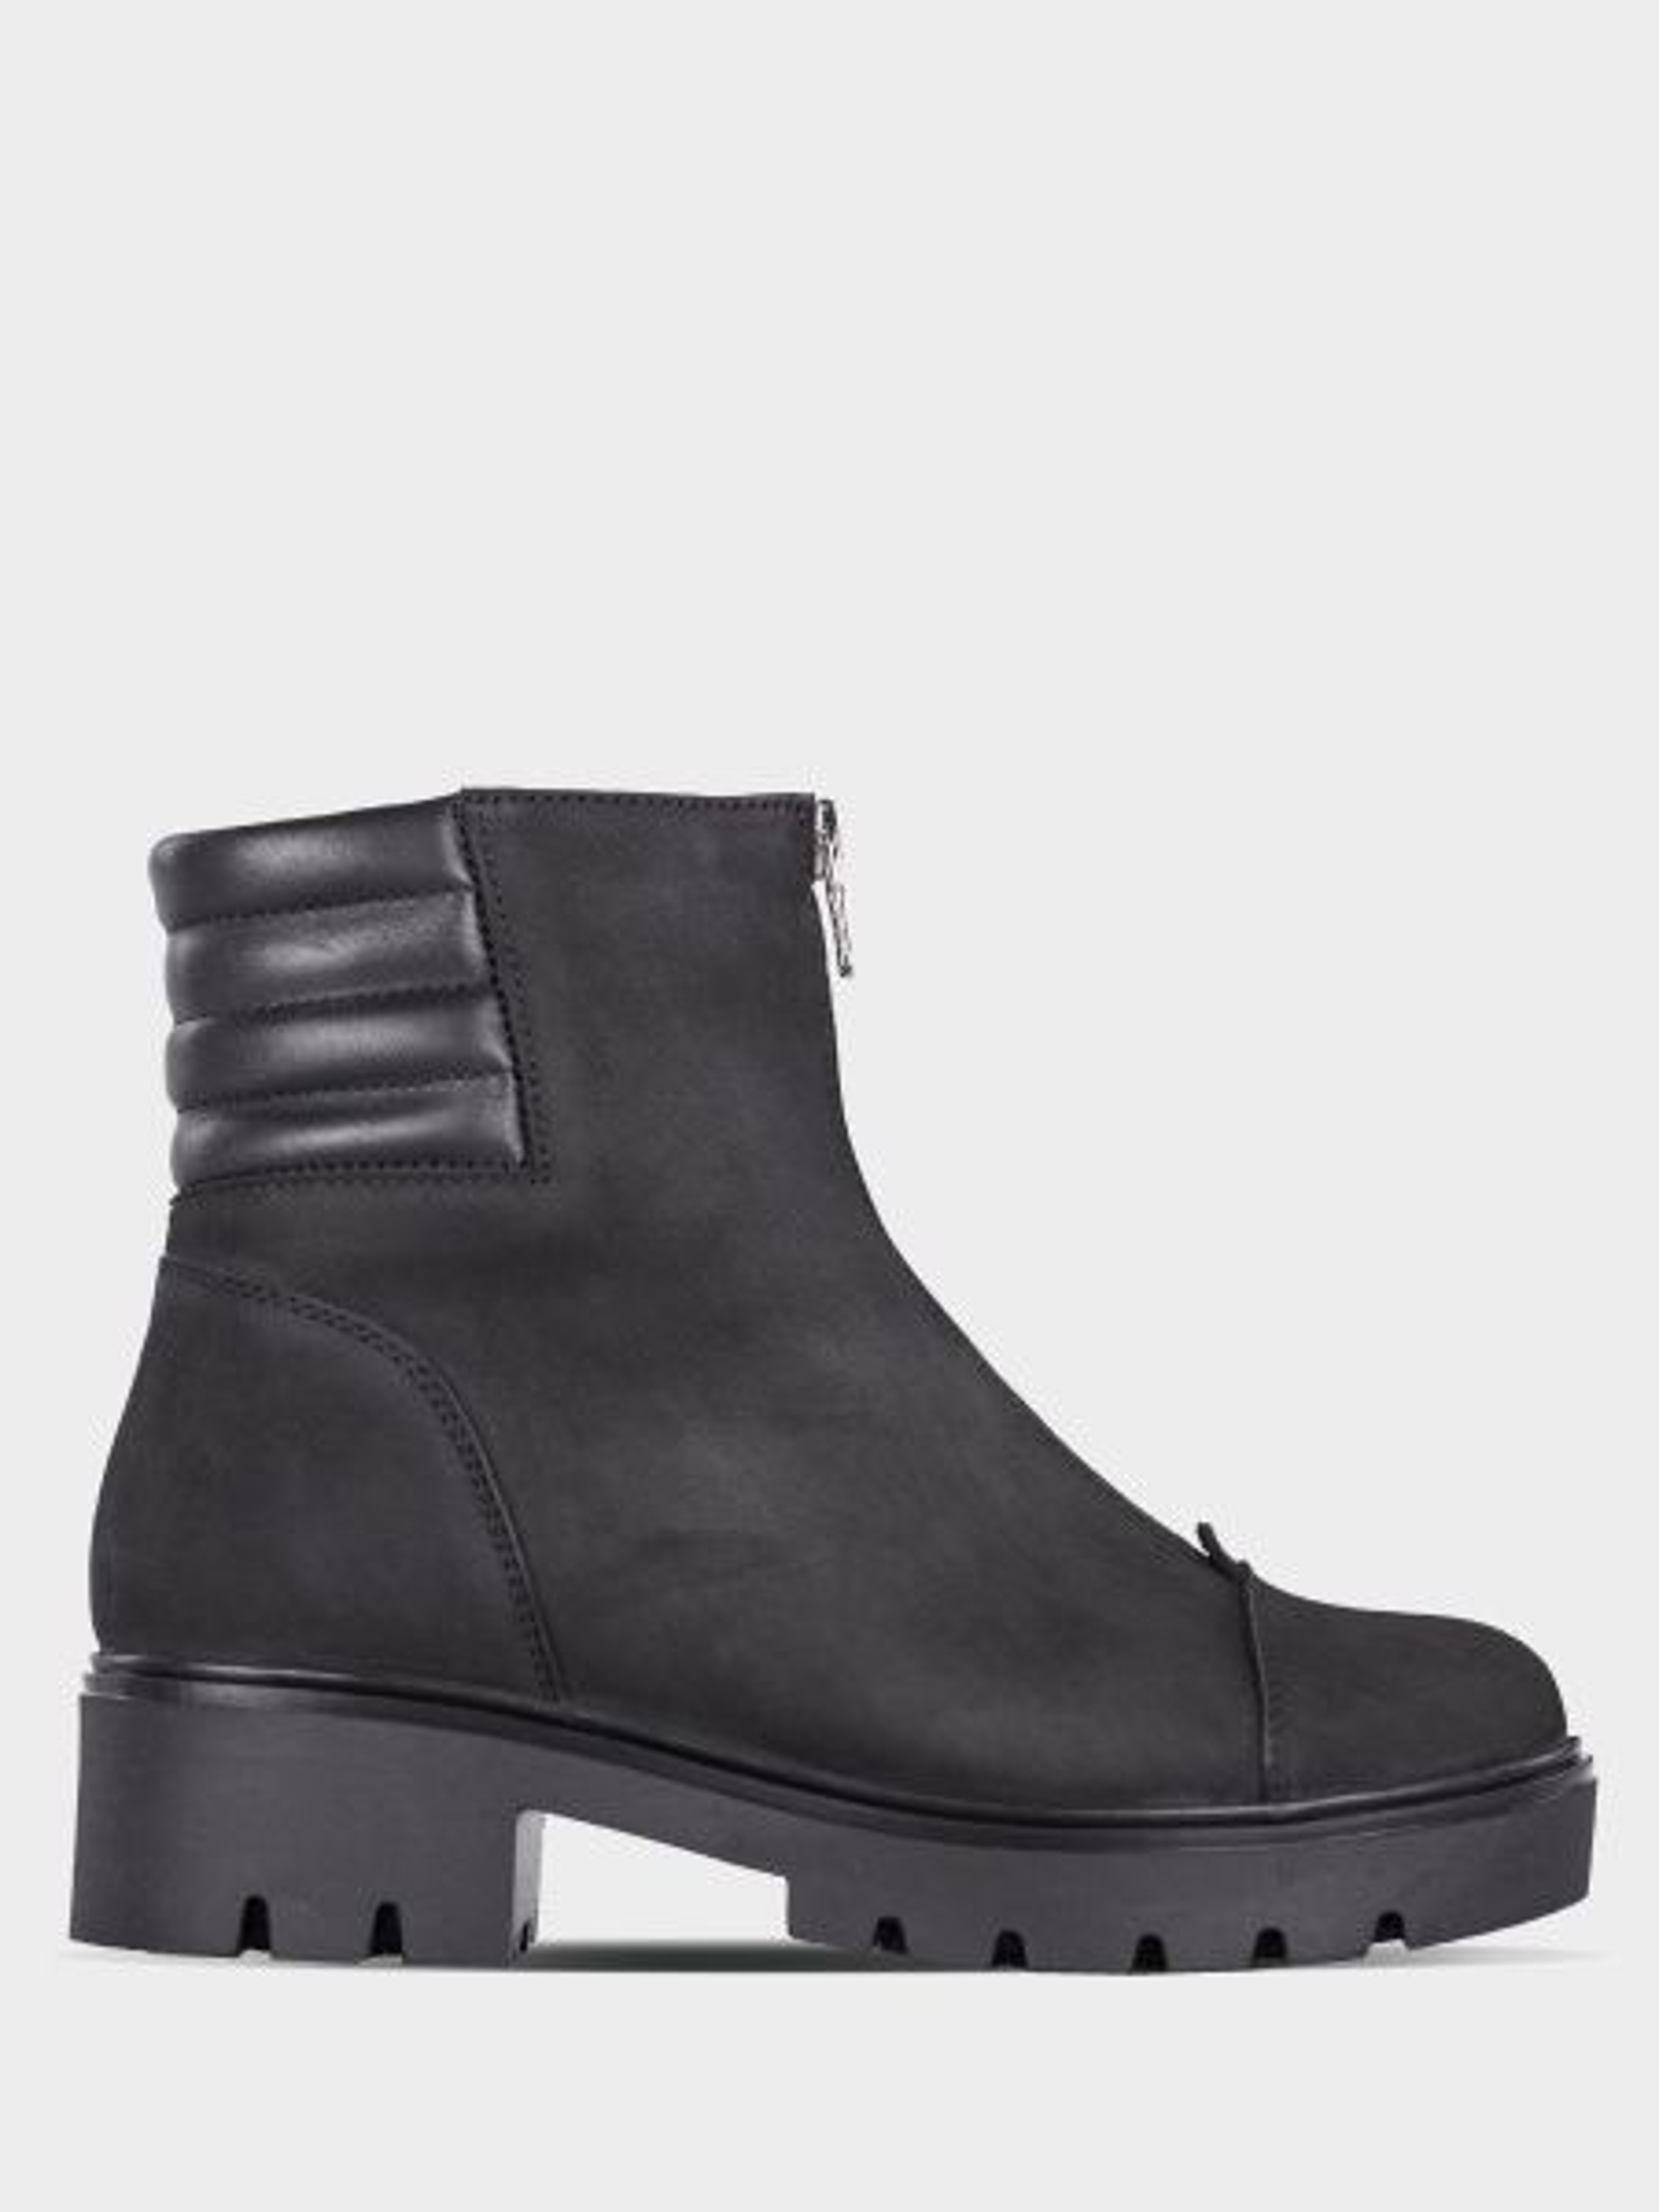 Ботинки для женщин TUTO 6L34 купить онлайн, 2017